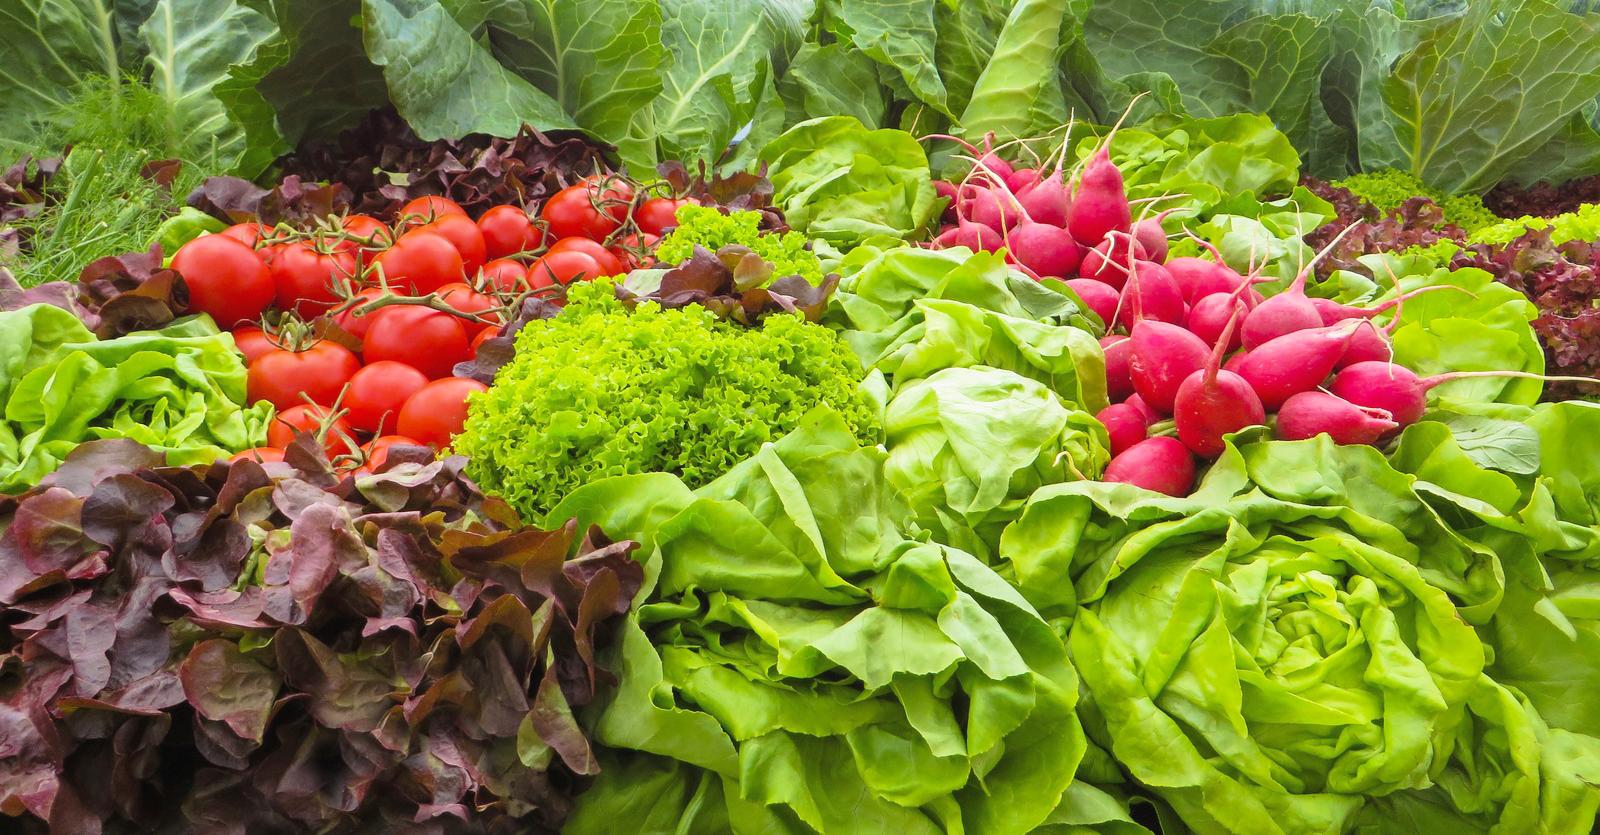 Sundays in the Garden: Vegetable Gardening for Everyone